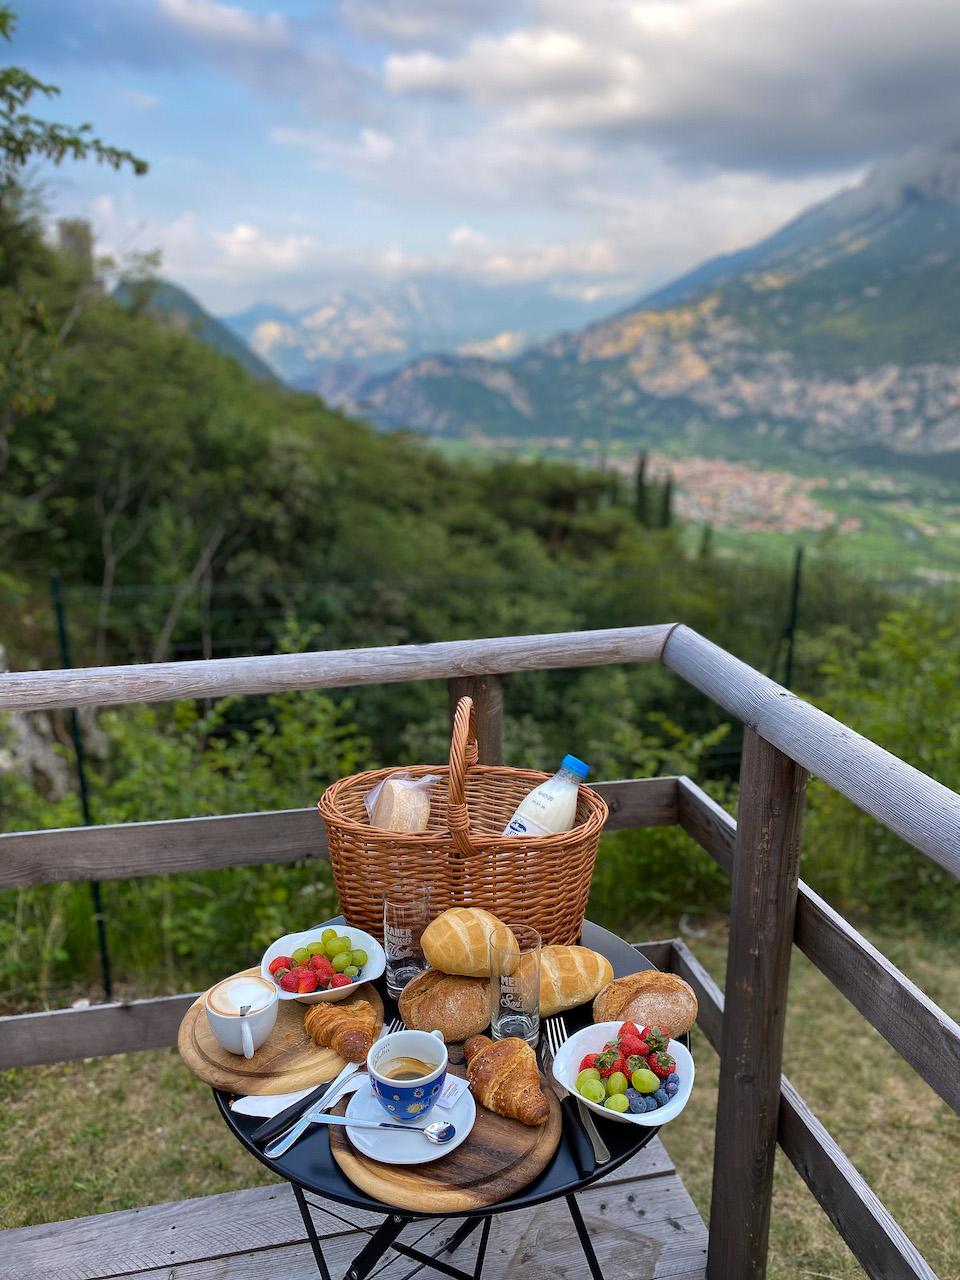 Overnachten rondom Riva del Garda Camping Drena